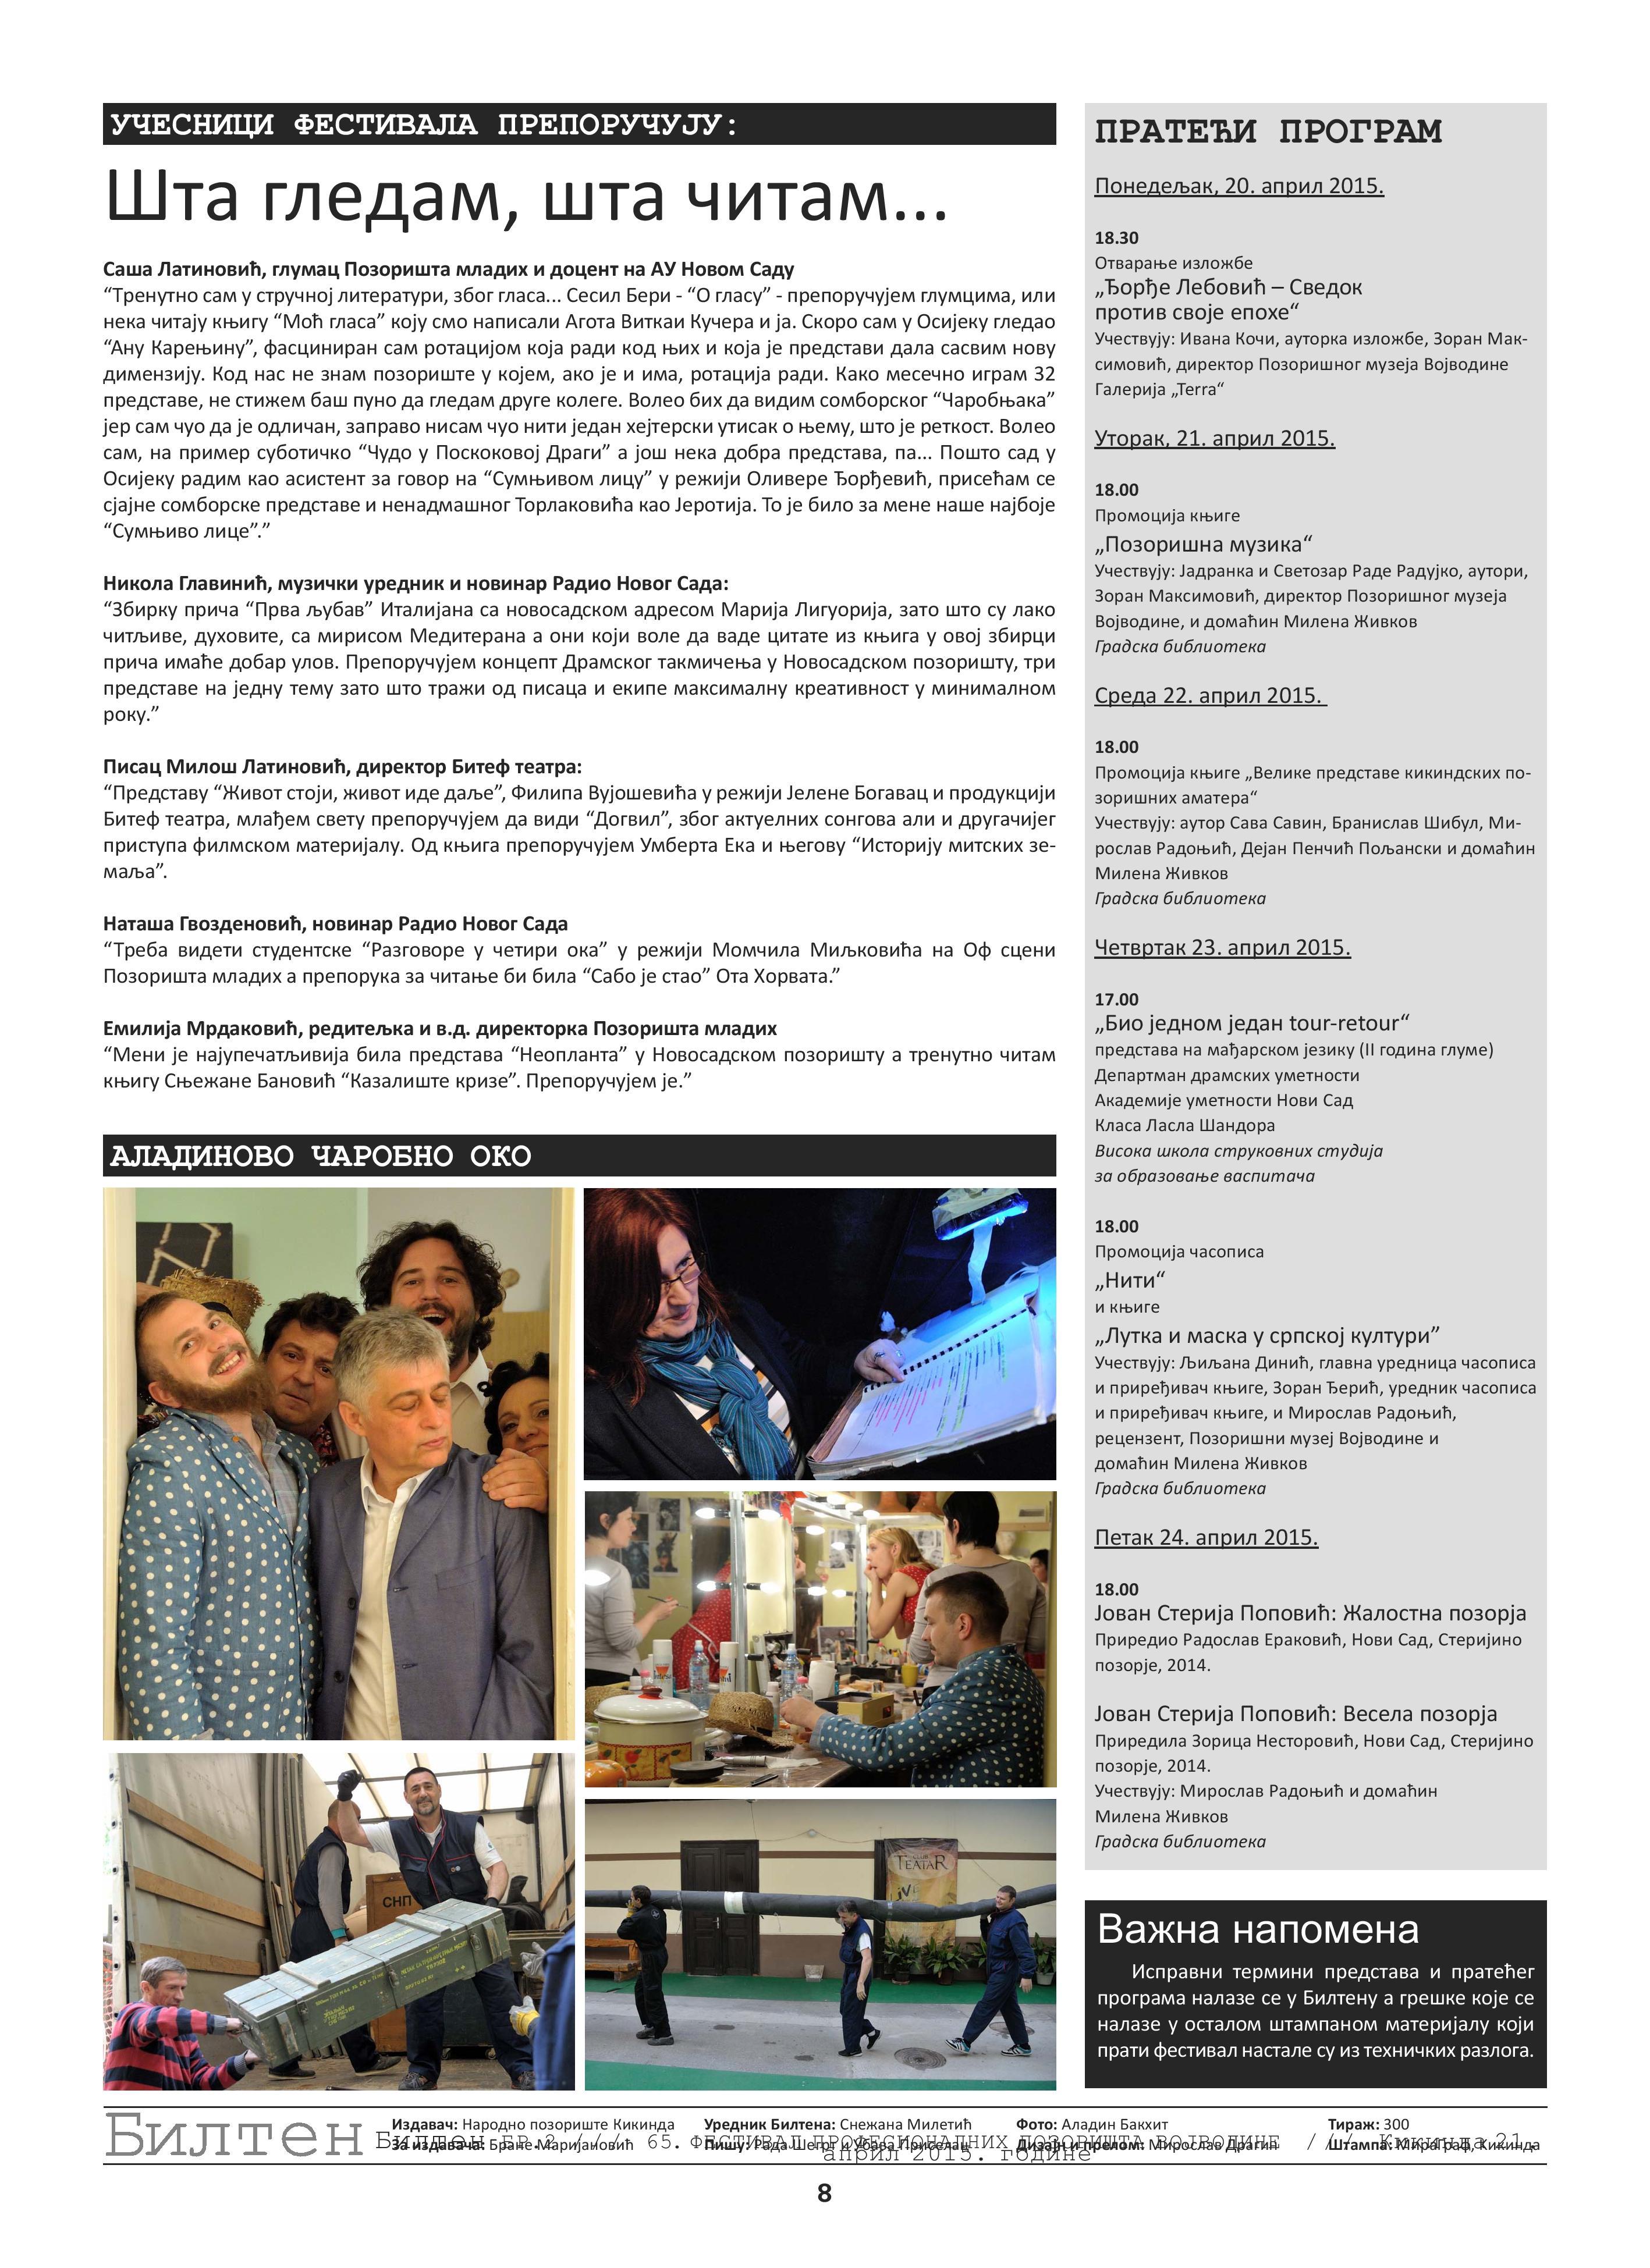 BILTEN_02_21 april-page-008